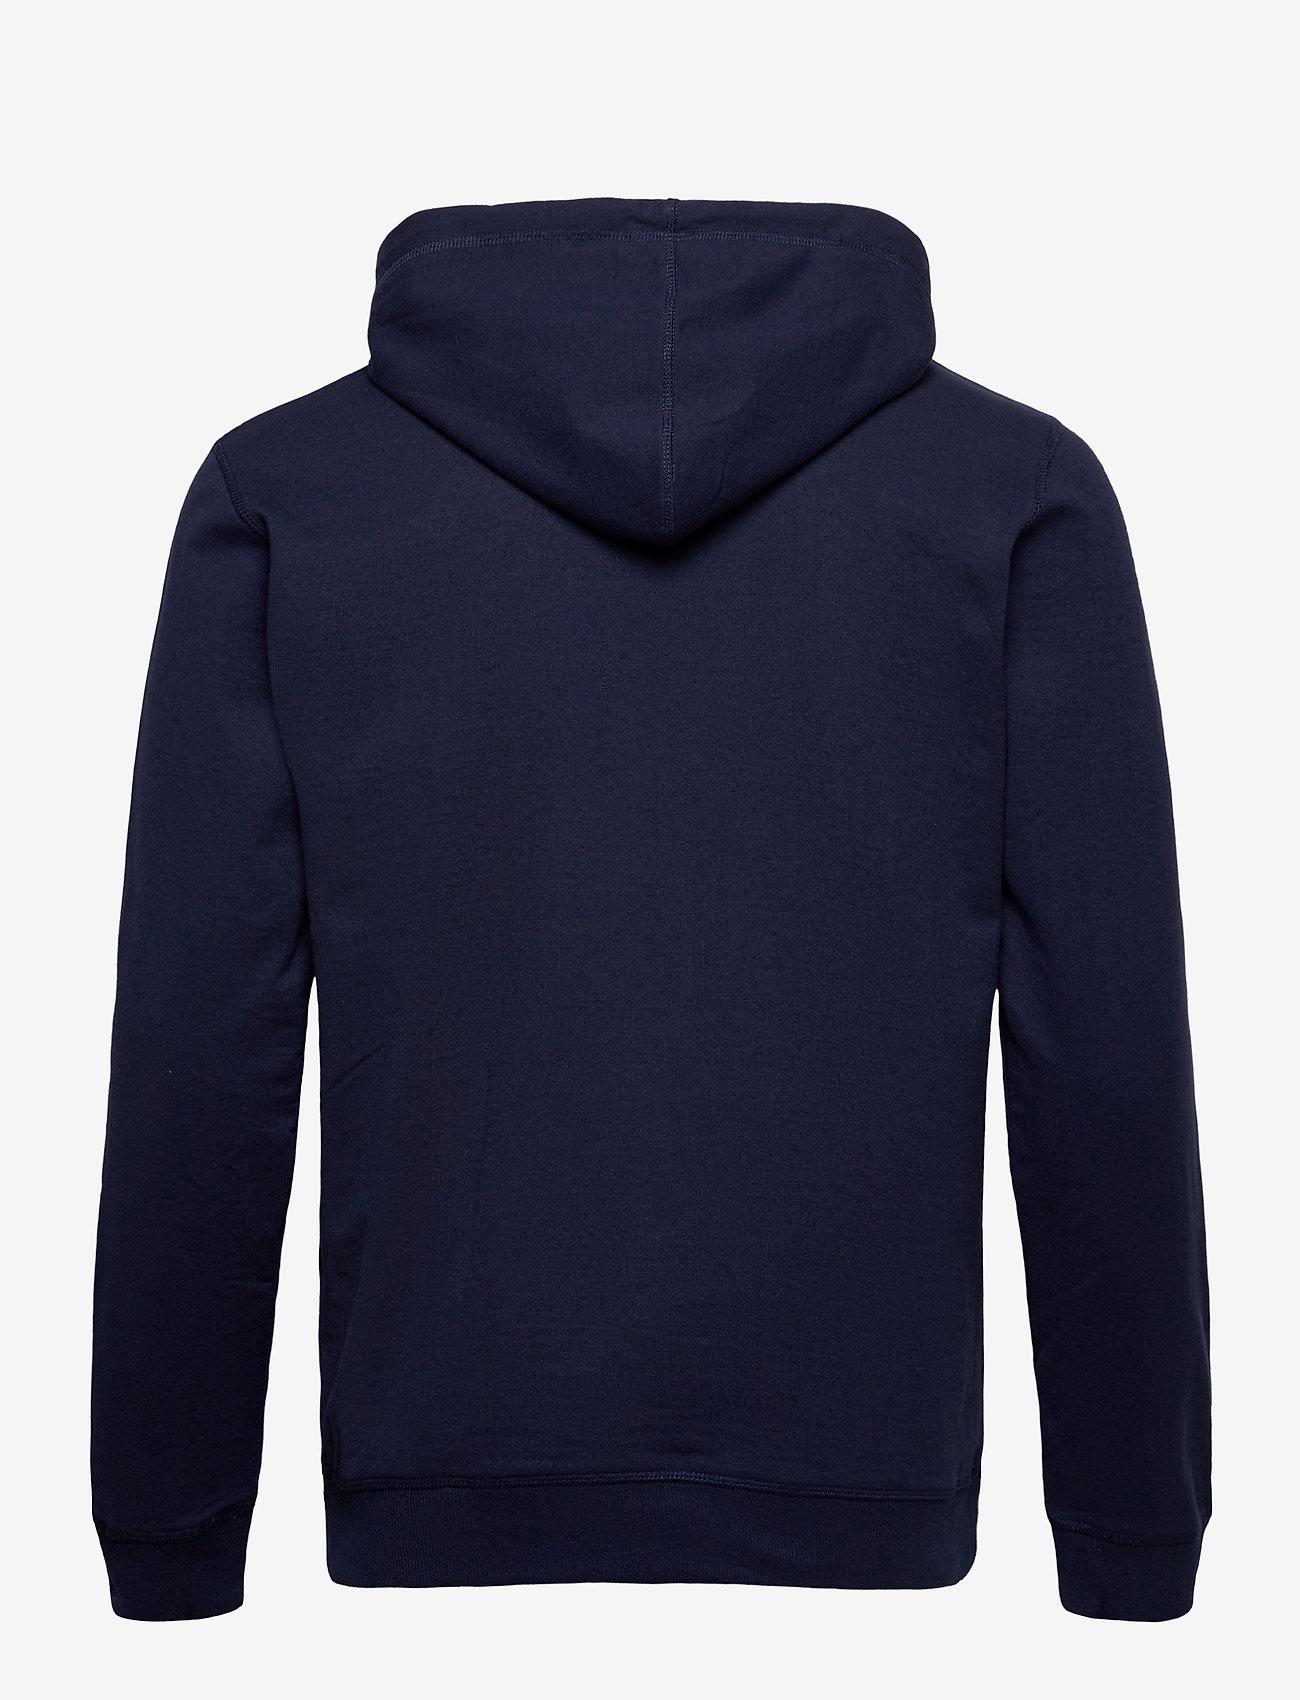 Minimum storms - Sweatshirts DARK SAPHIRE - Menn Klær